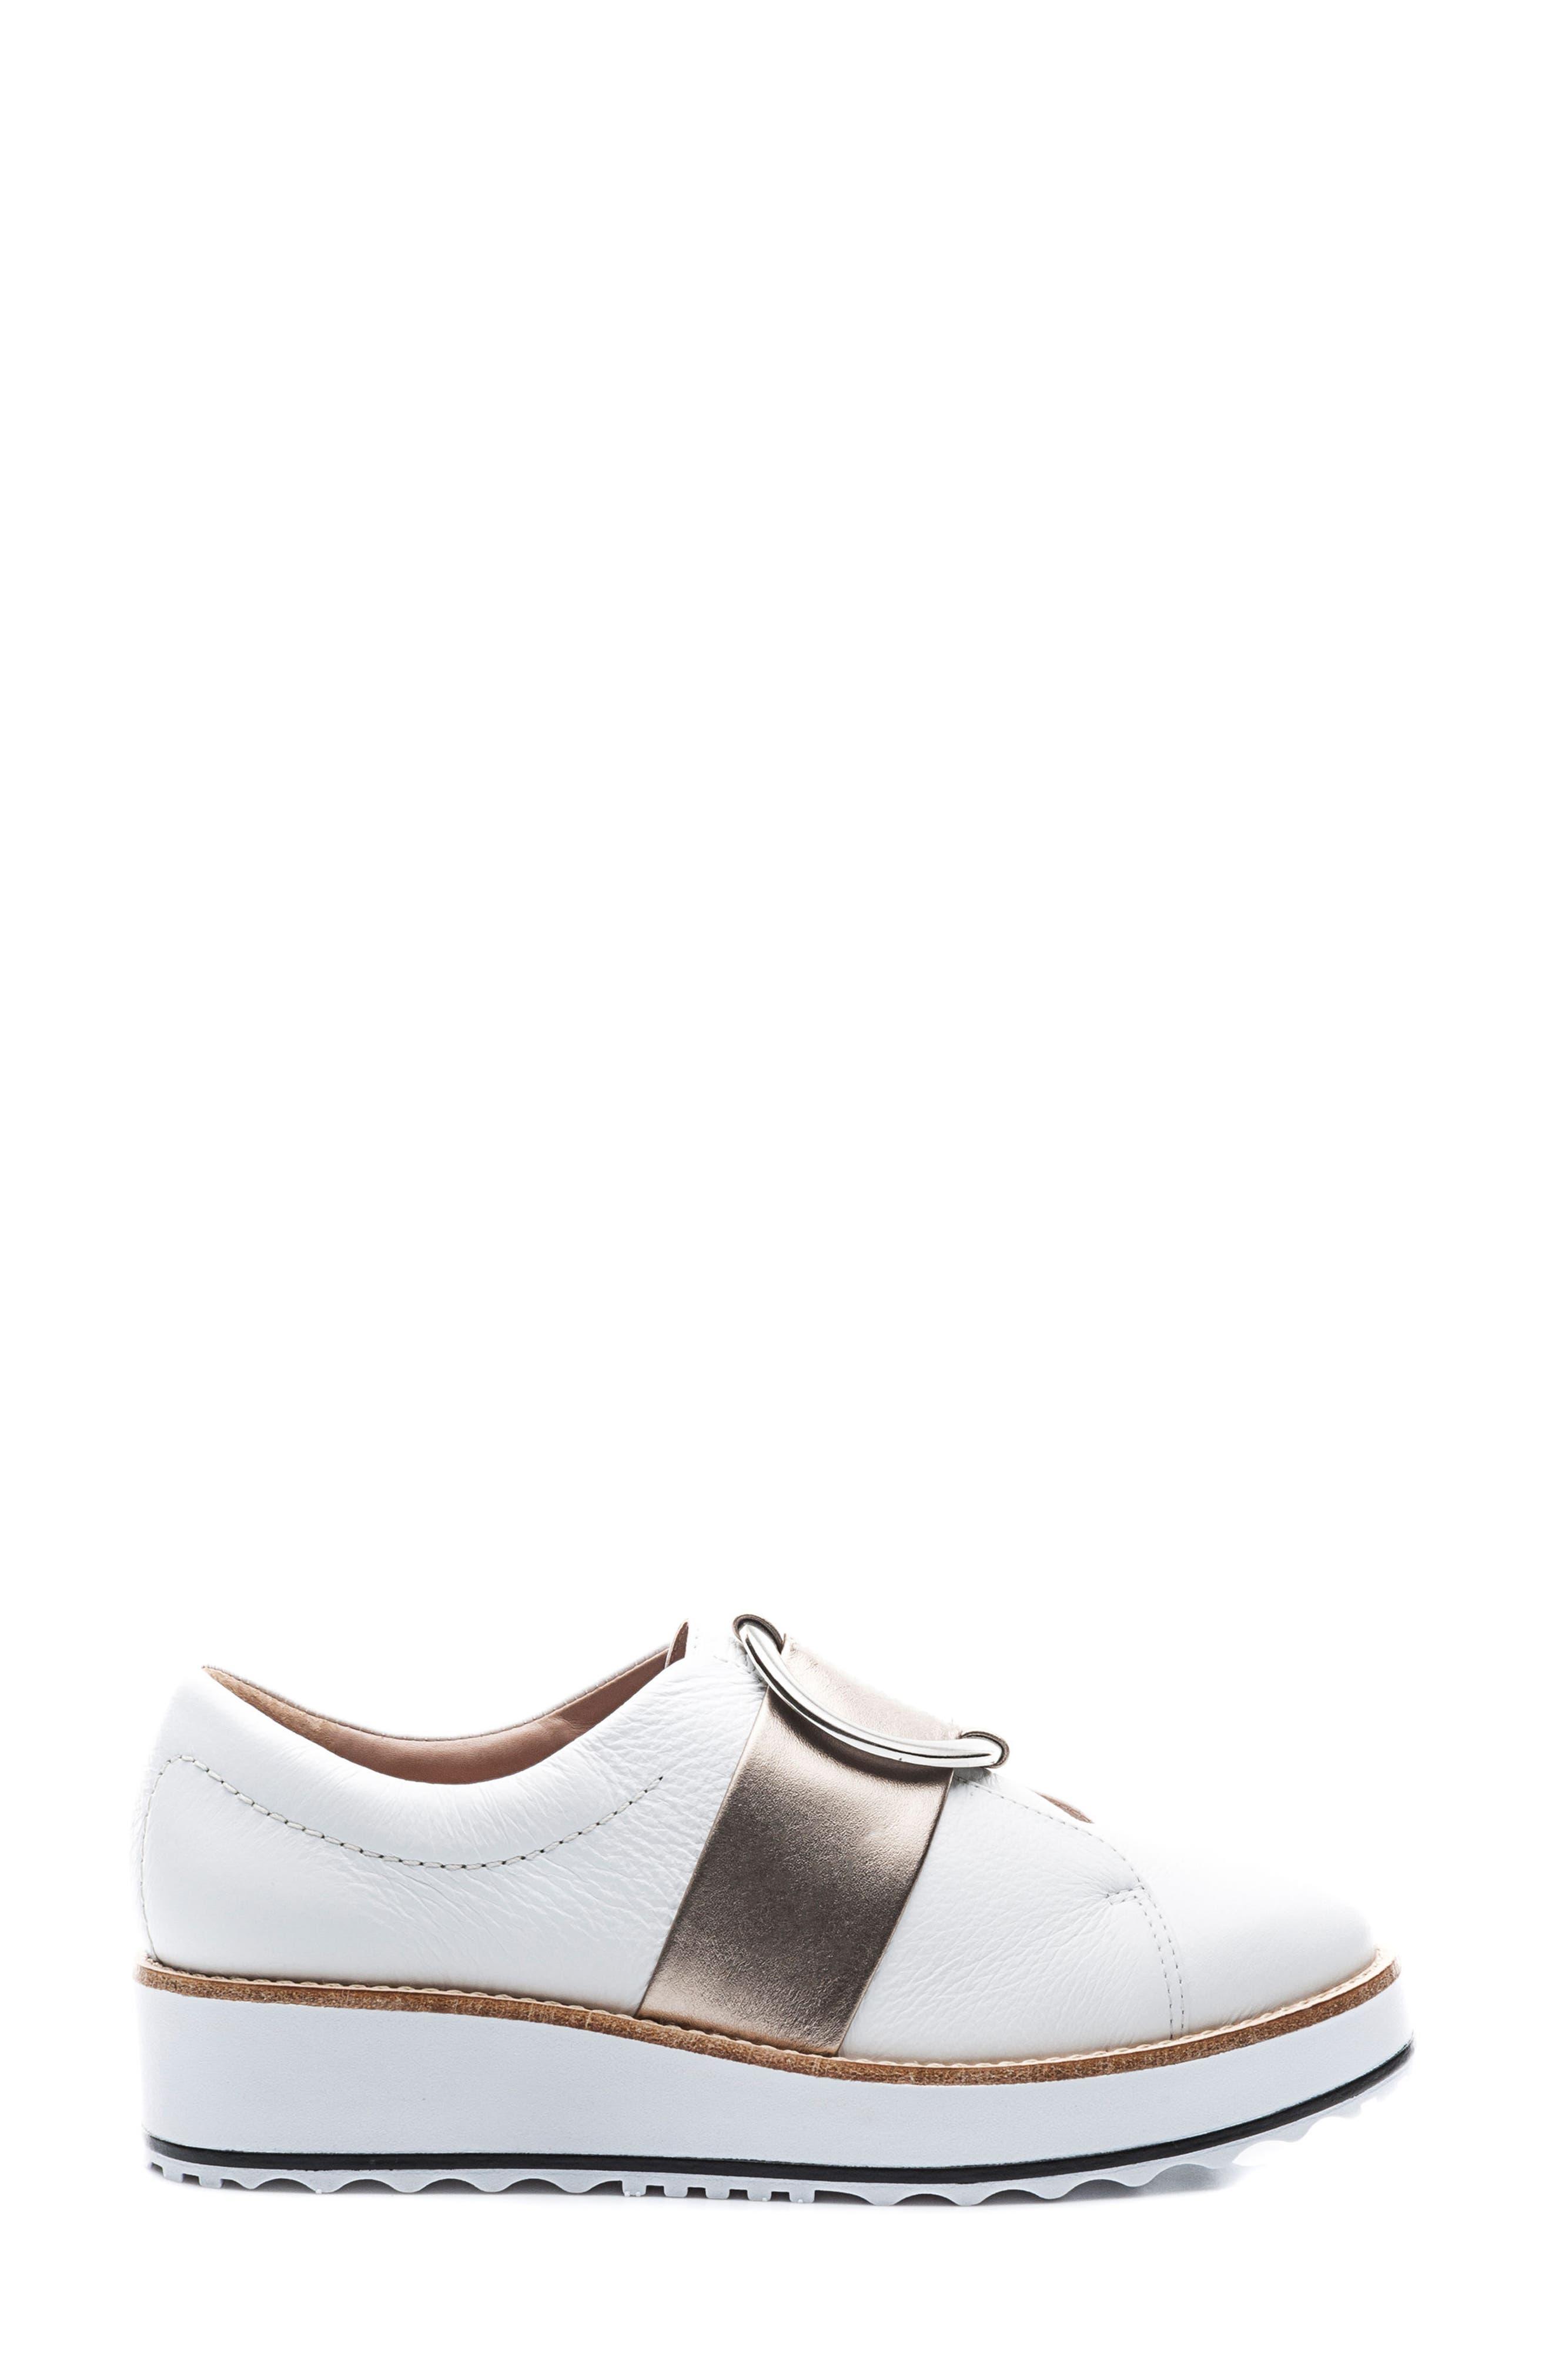 Susan Wedge Sneaker,                             Alternate thumbnail 3, color,                             100